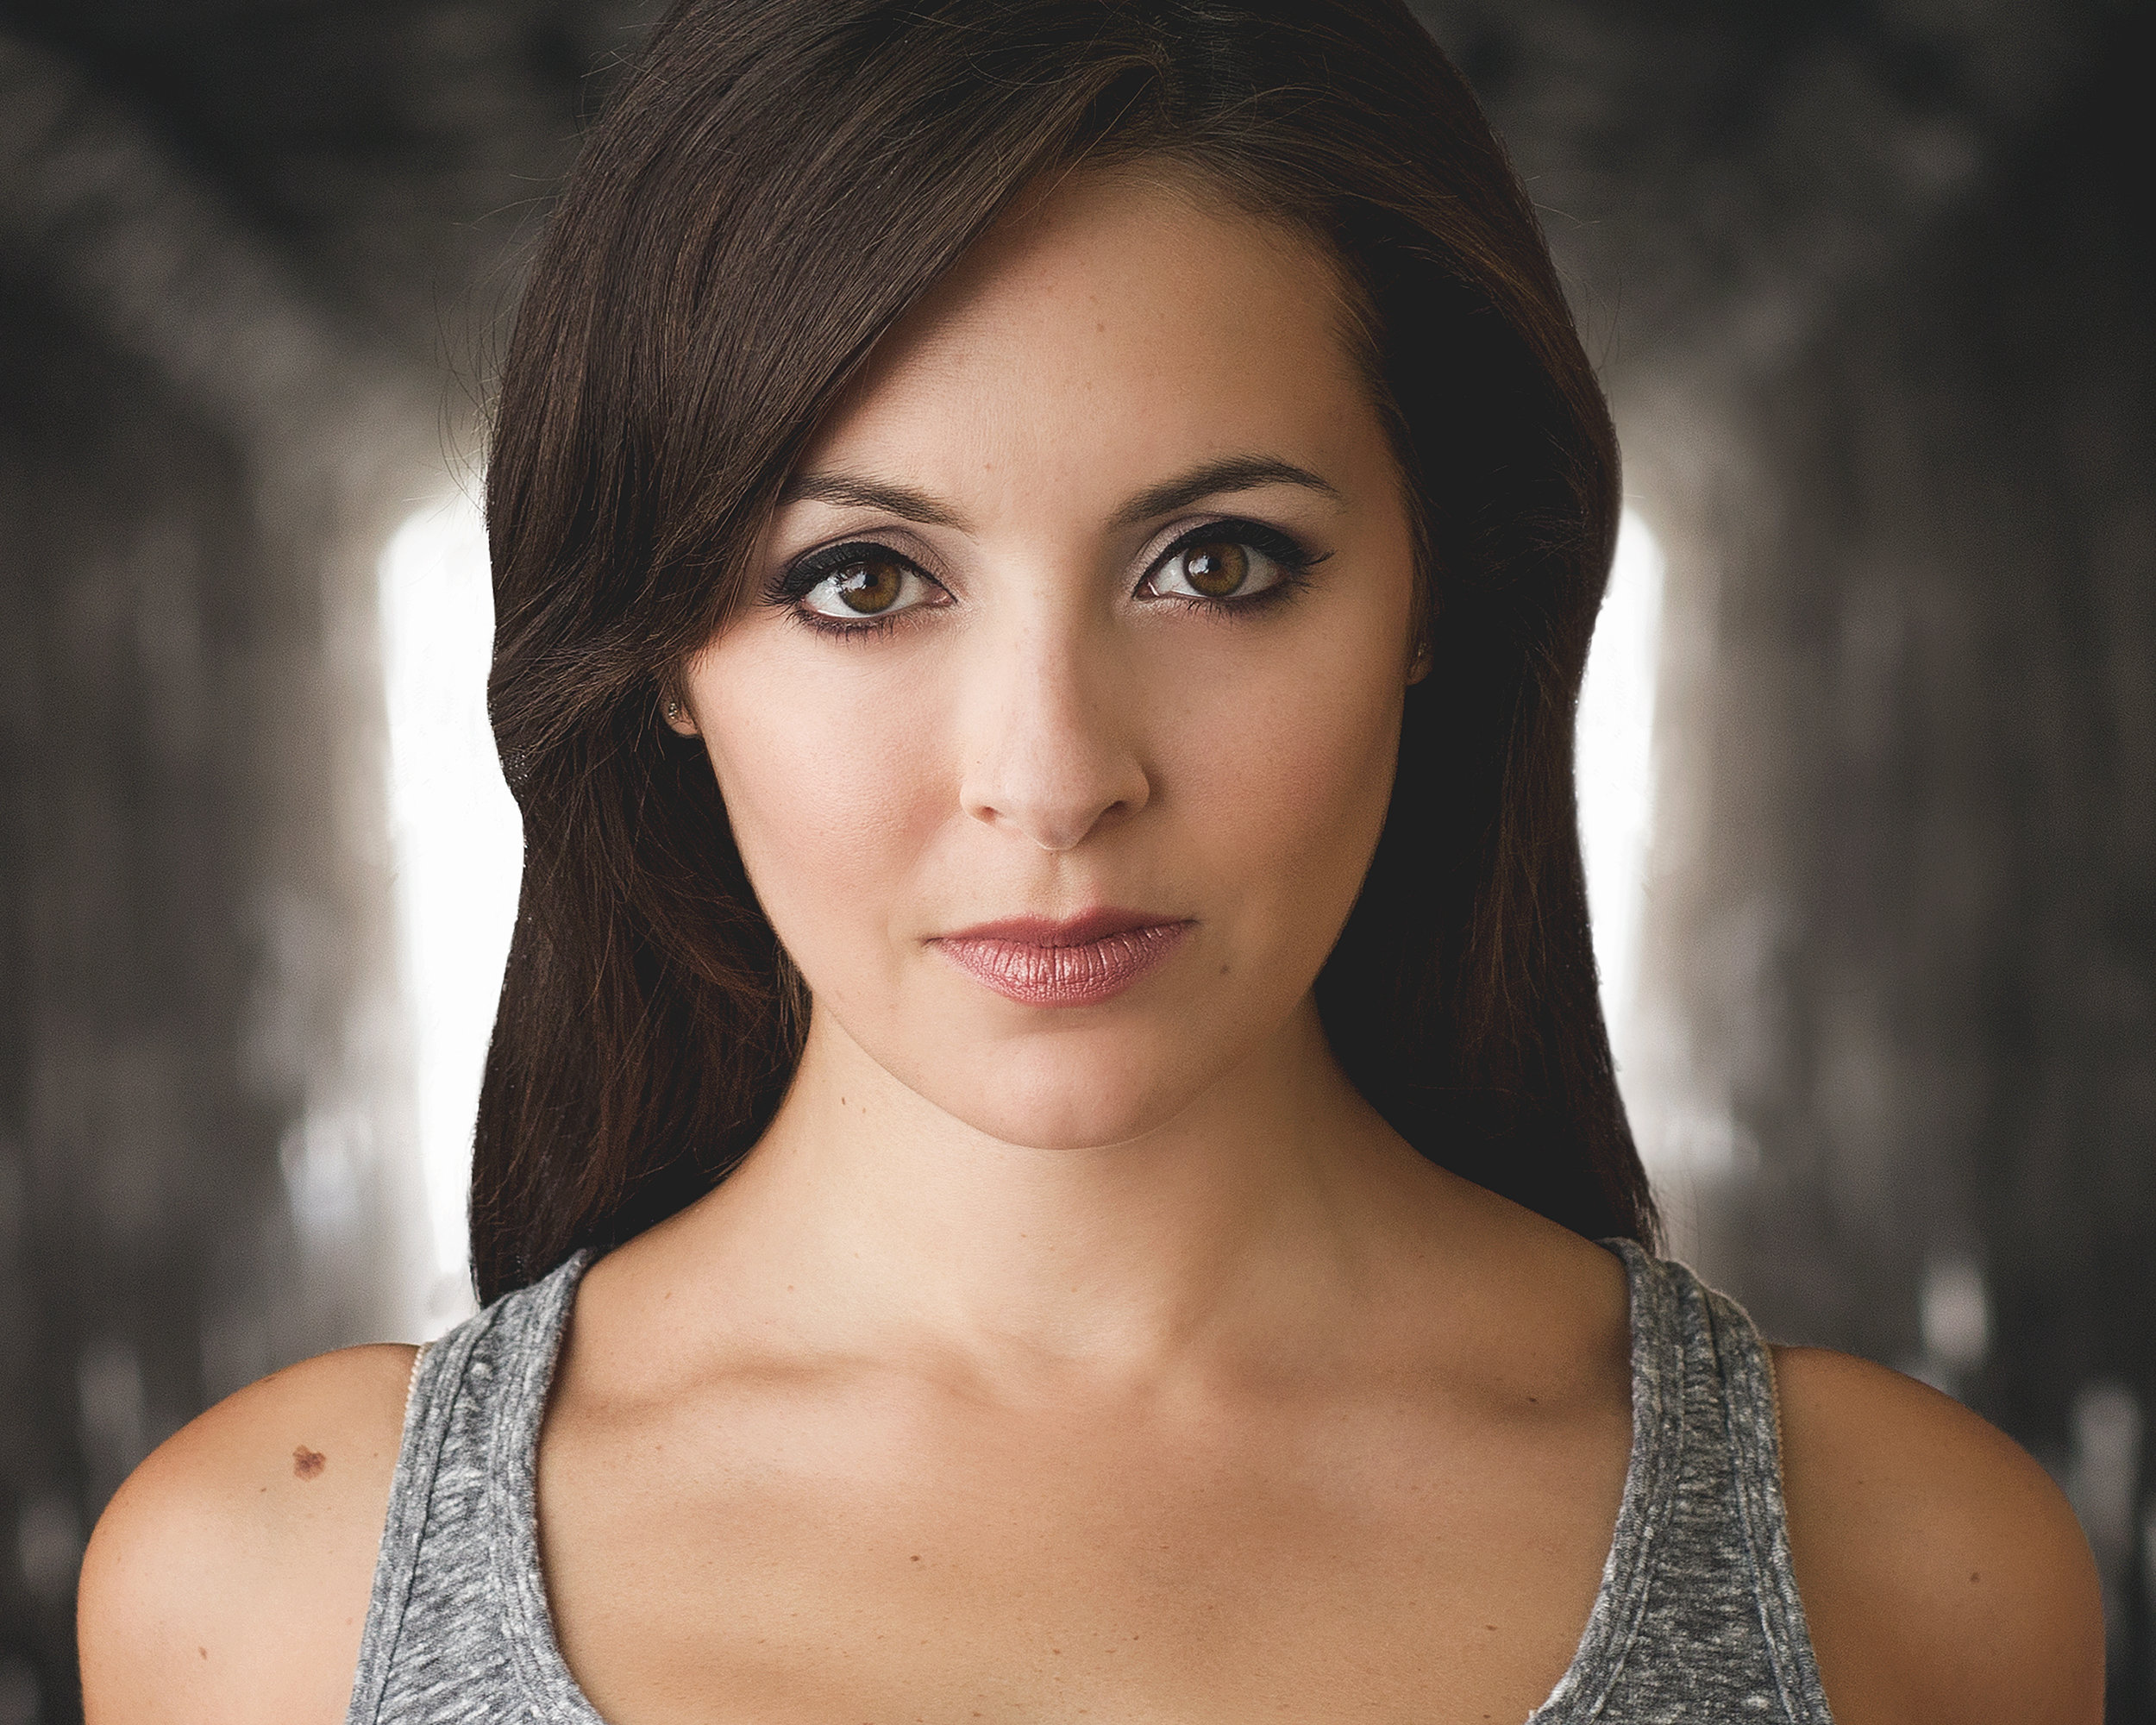 Christina DeCicco headshot 1.jpg